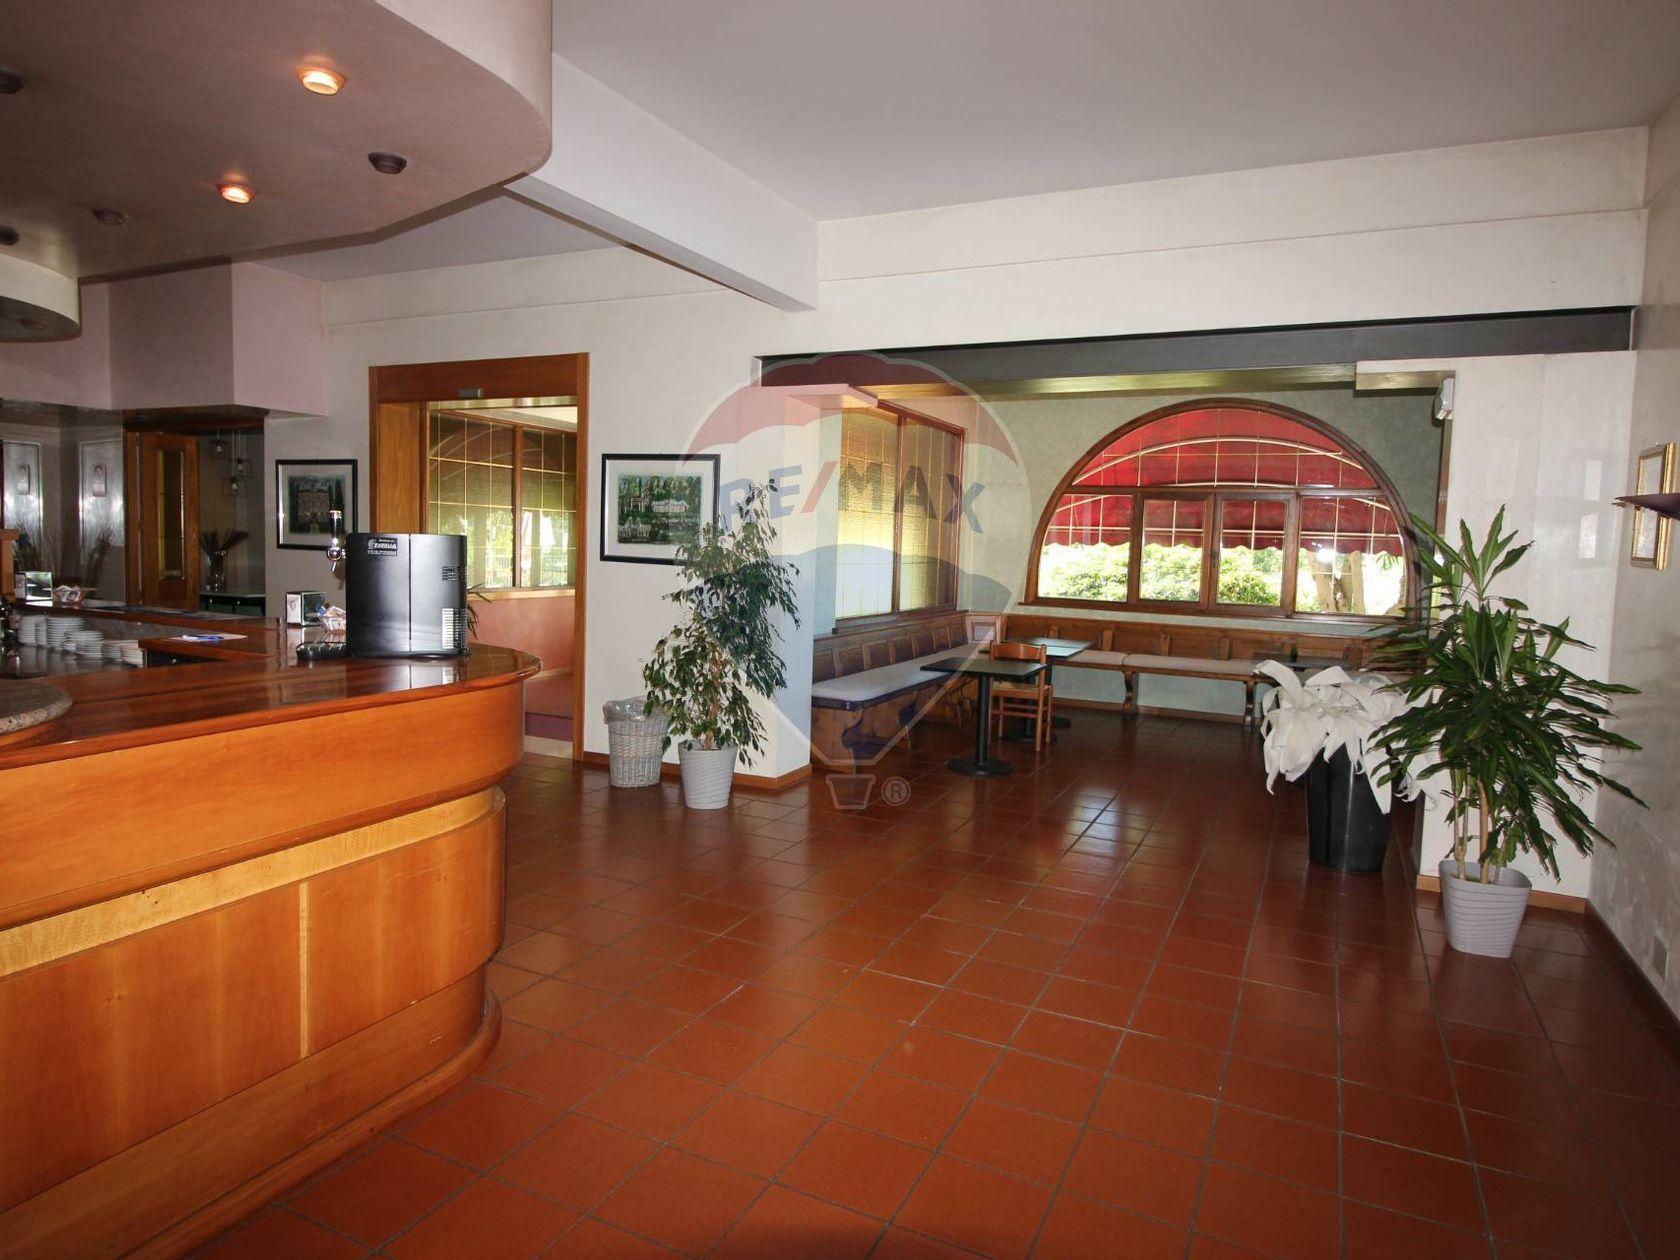 Albergo/Hotel Valmarana, Altavilla Vicentina, VI Vendita - Foto 5